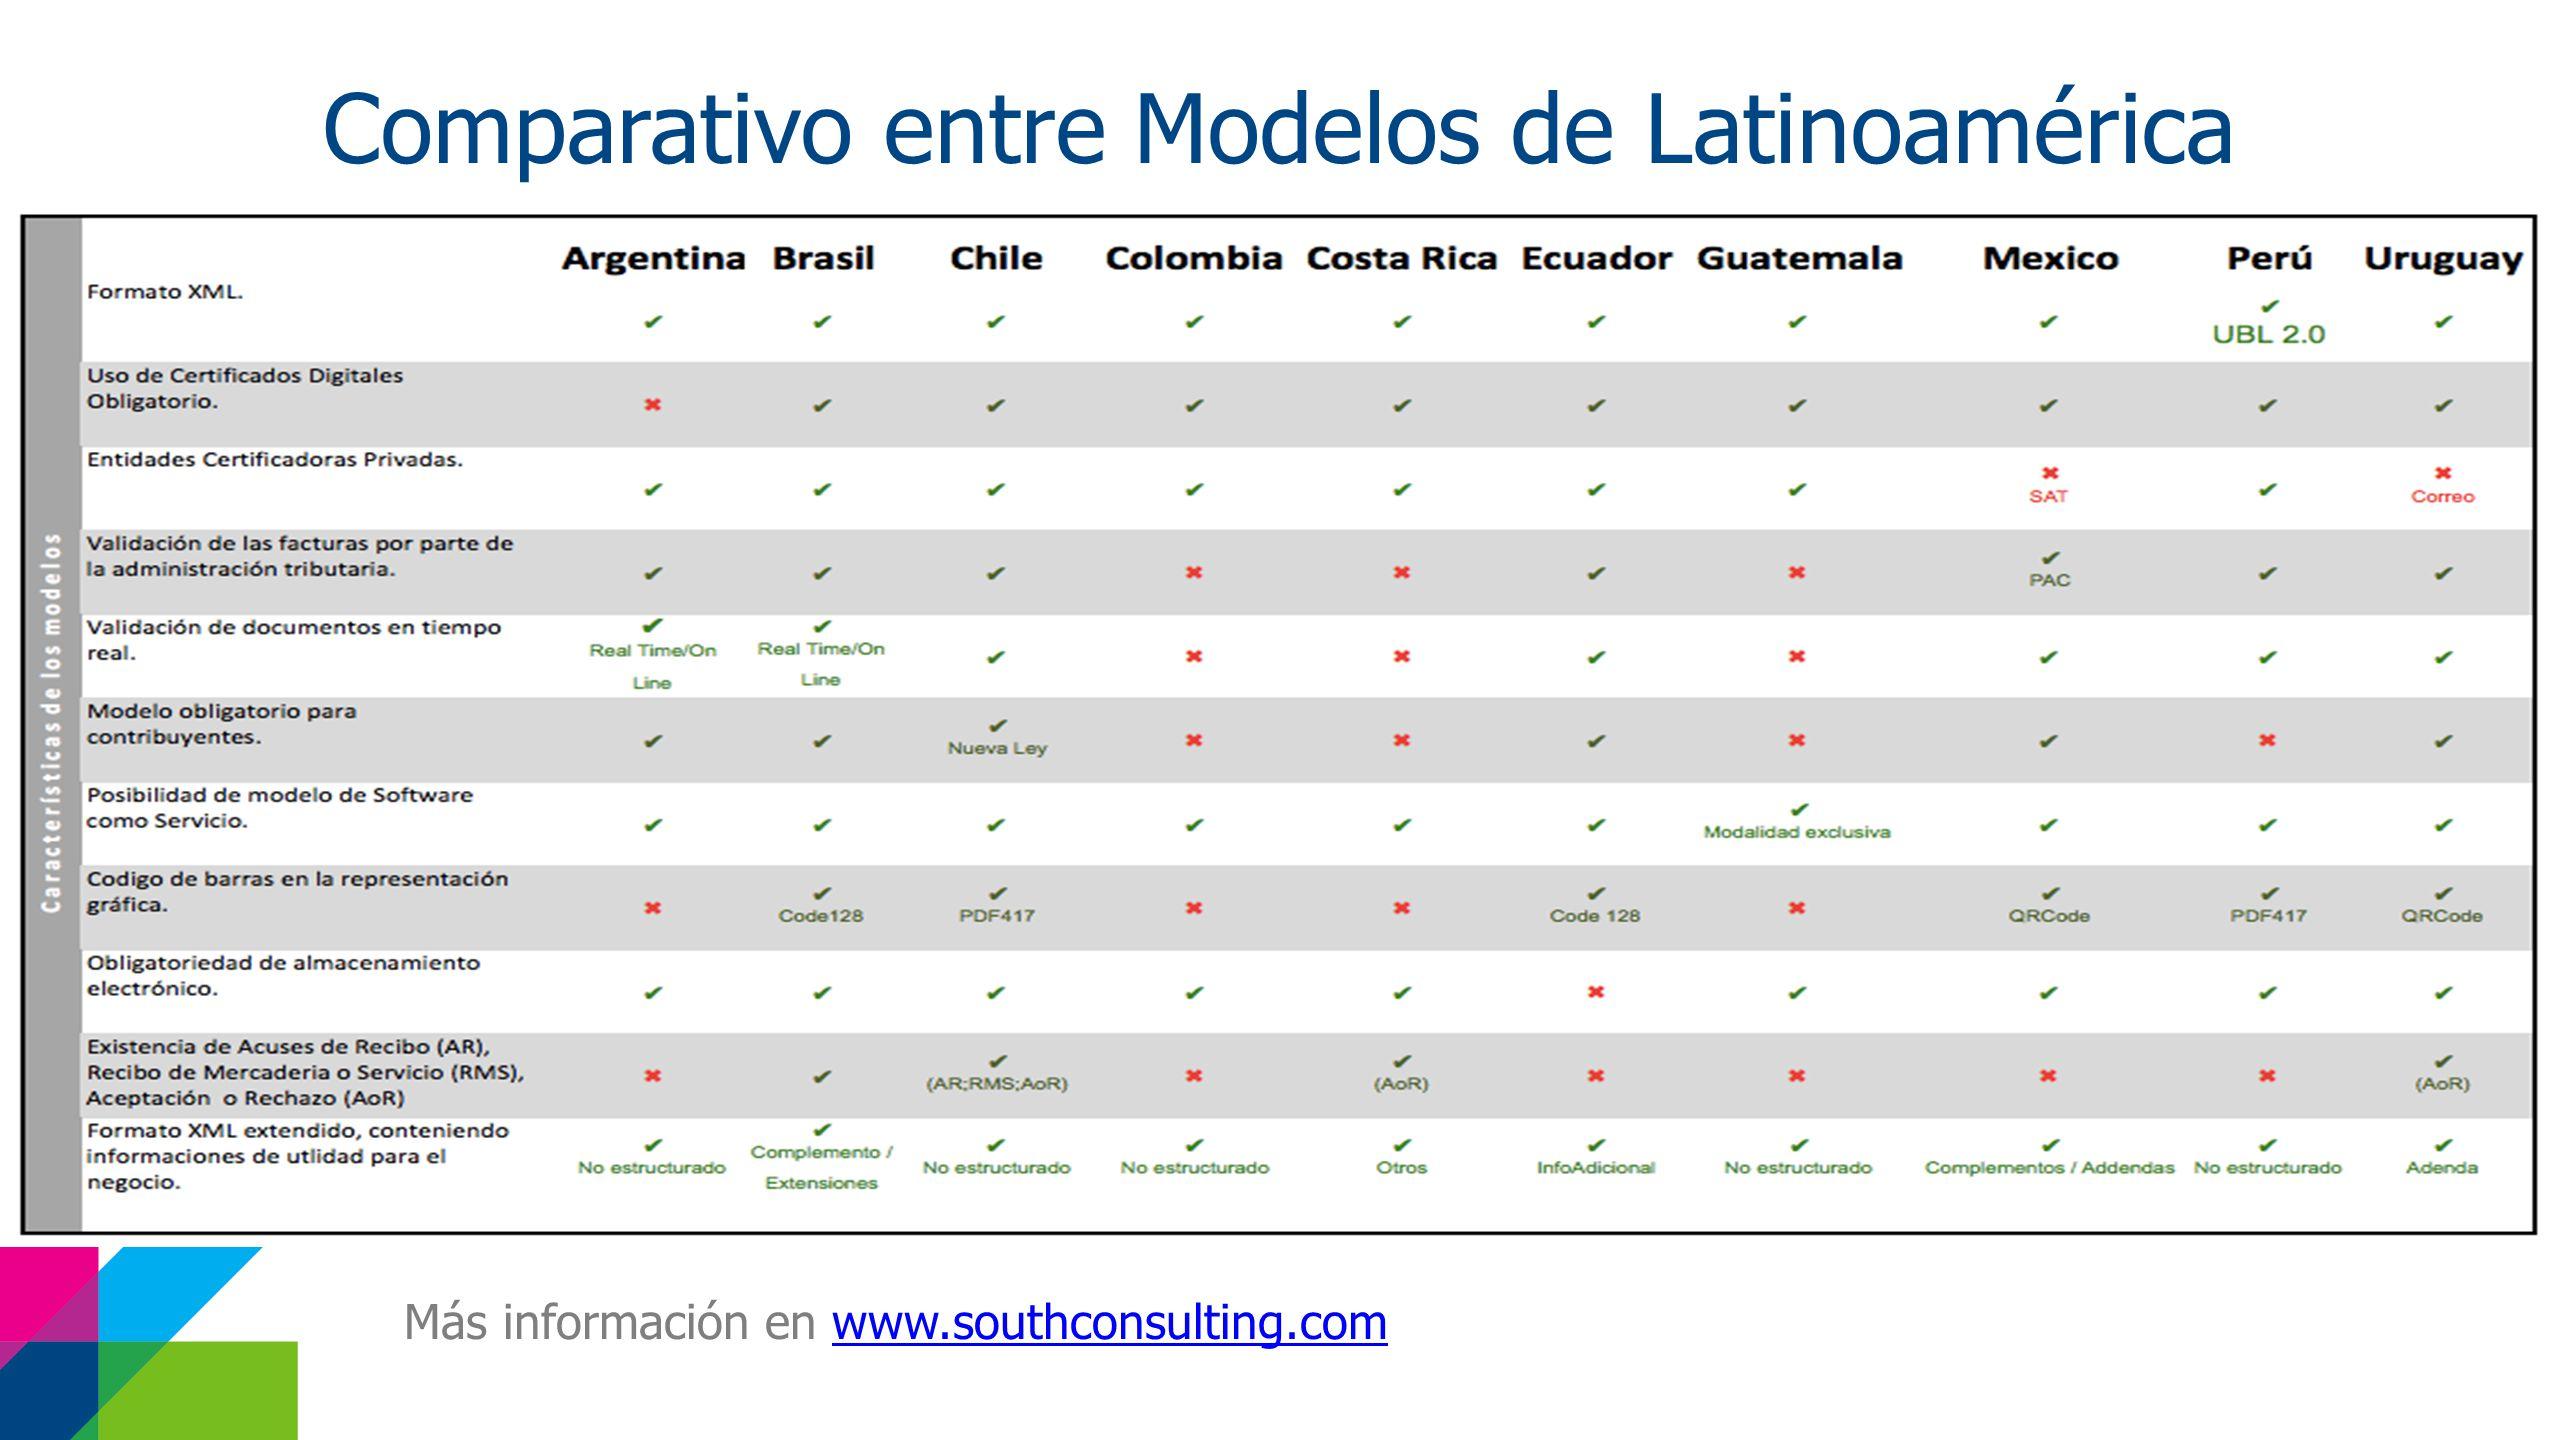 Comparativo entre Modelos de Latinoamérica